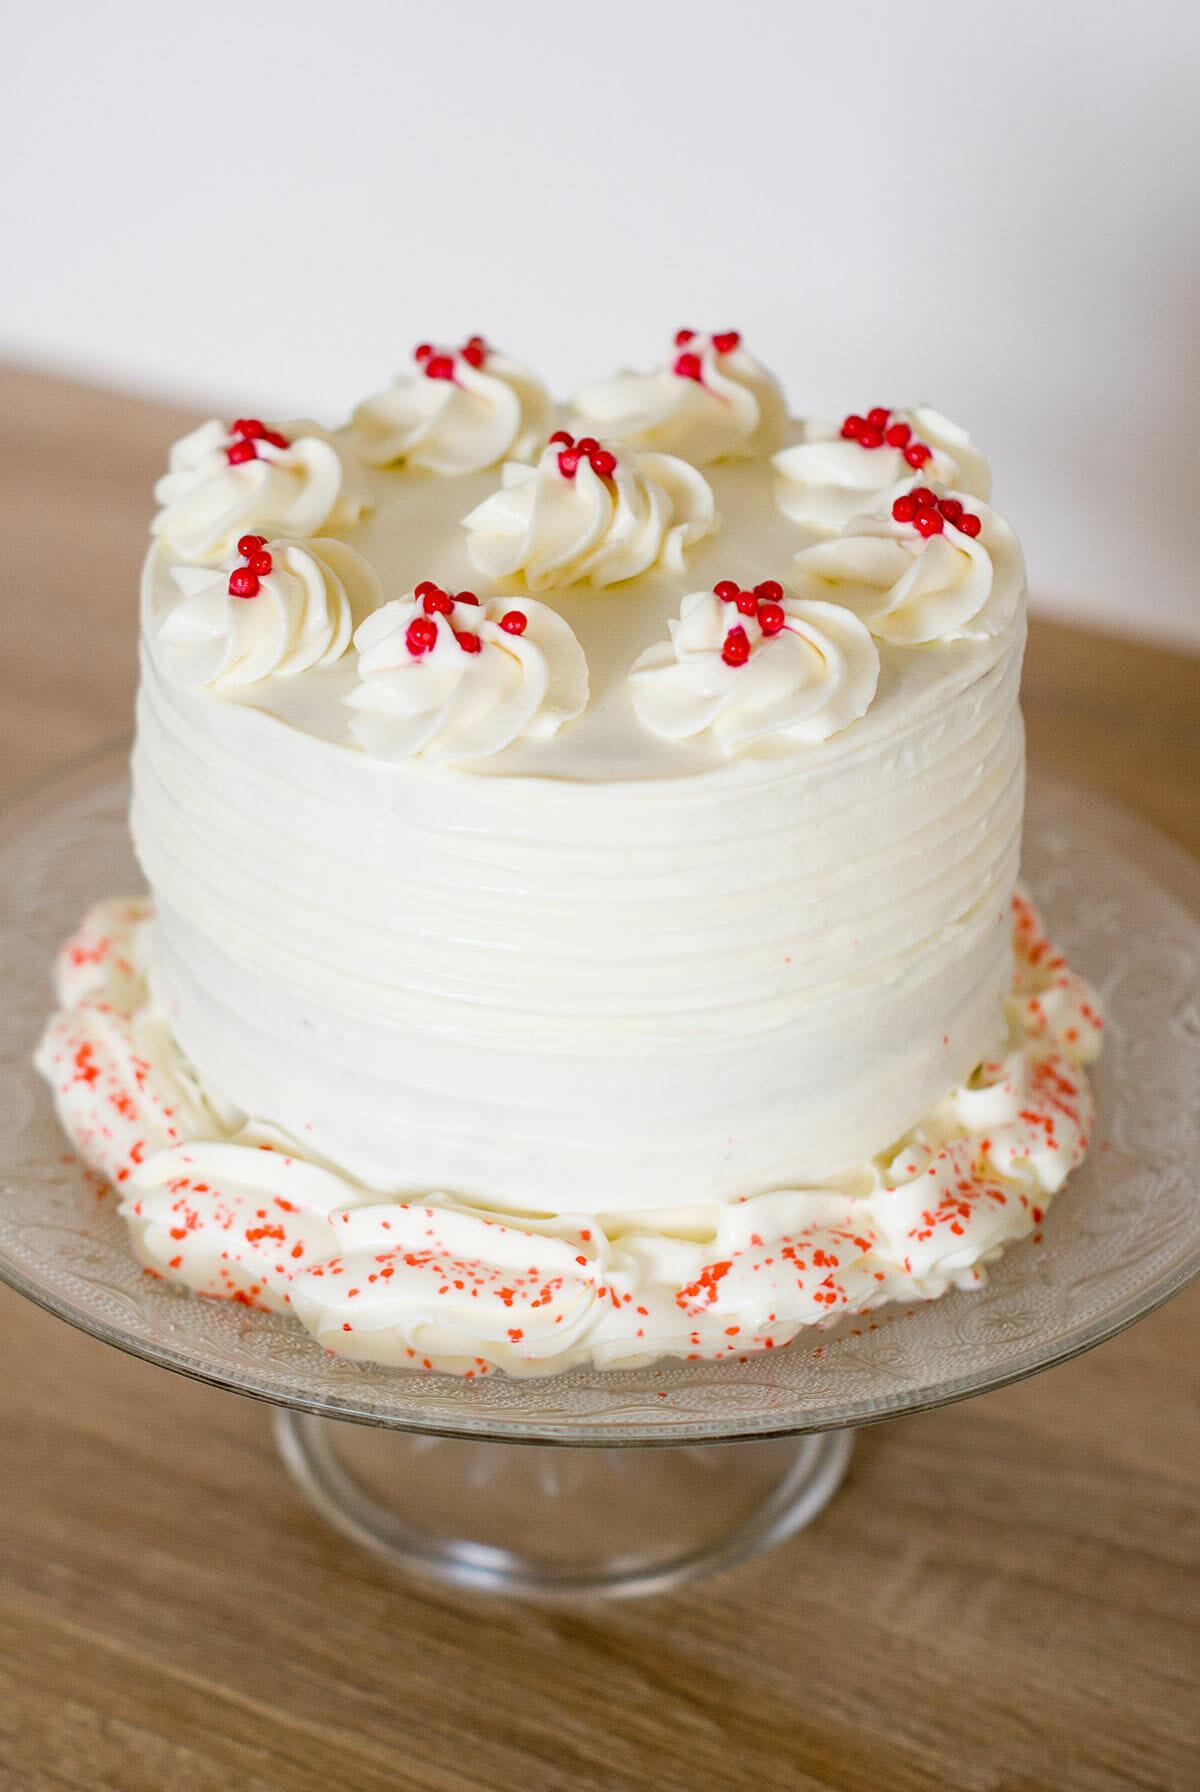 ... red velvet and chocolate layer cake red velvet layer cake recipe